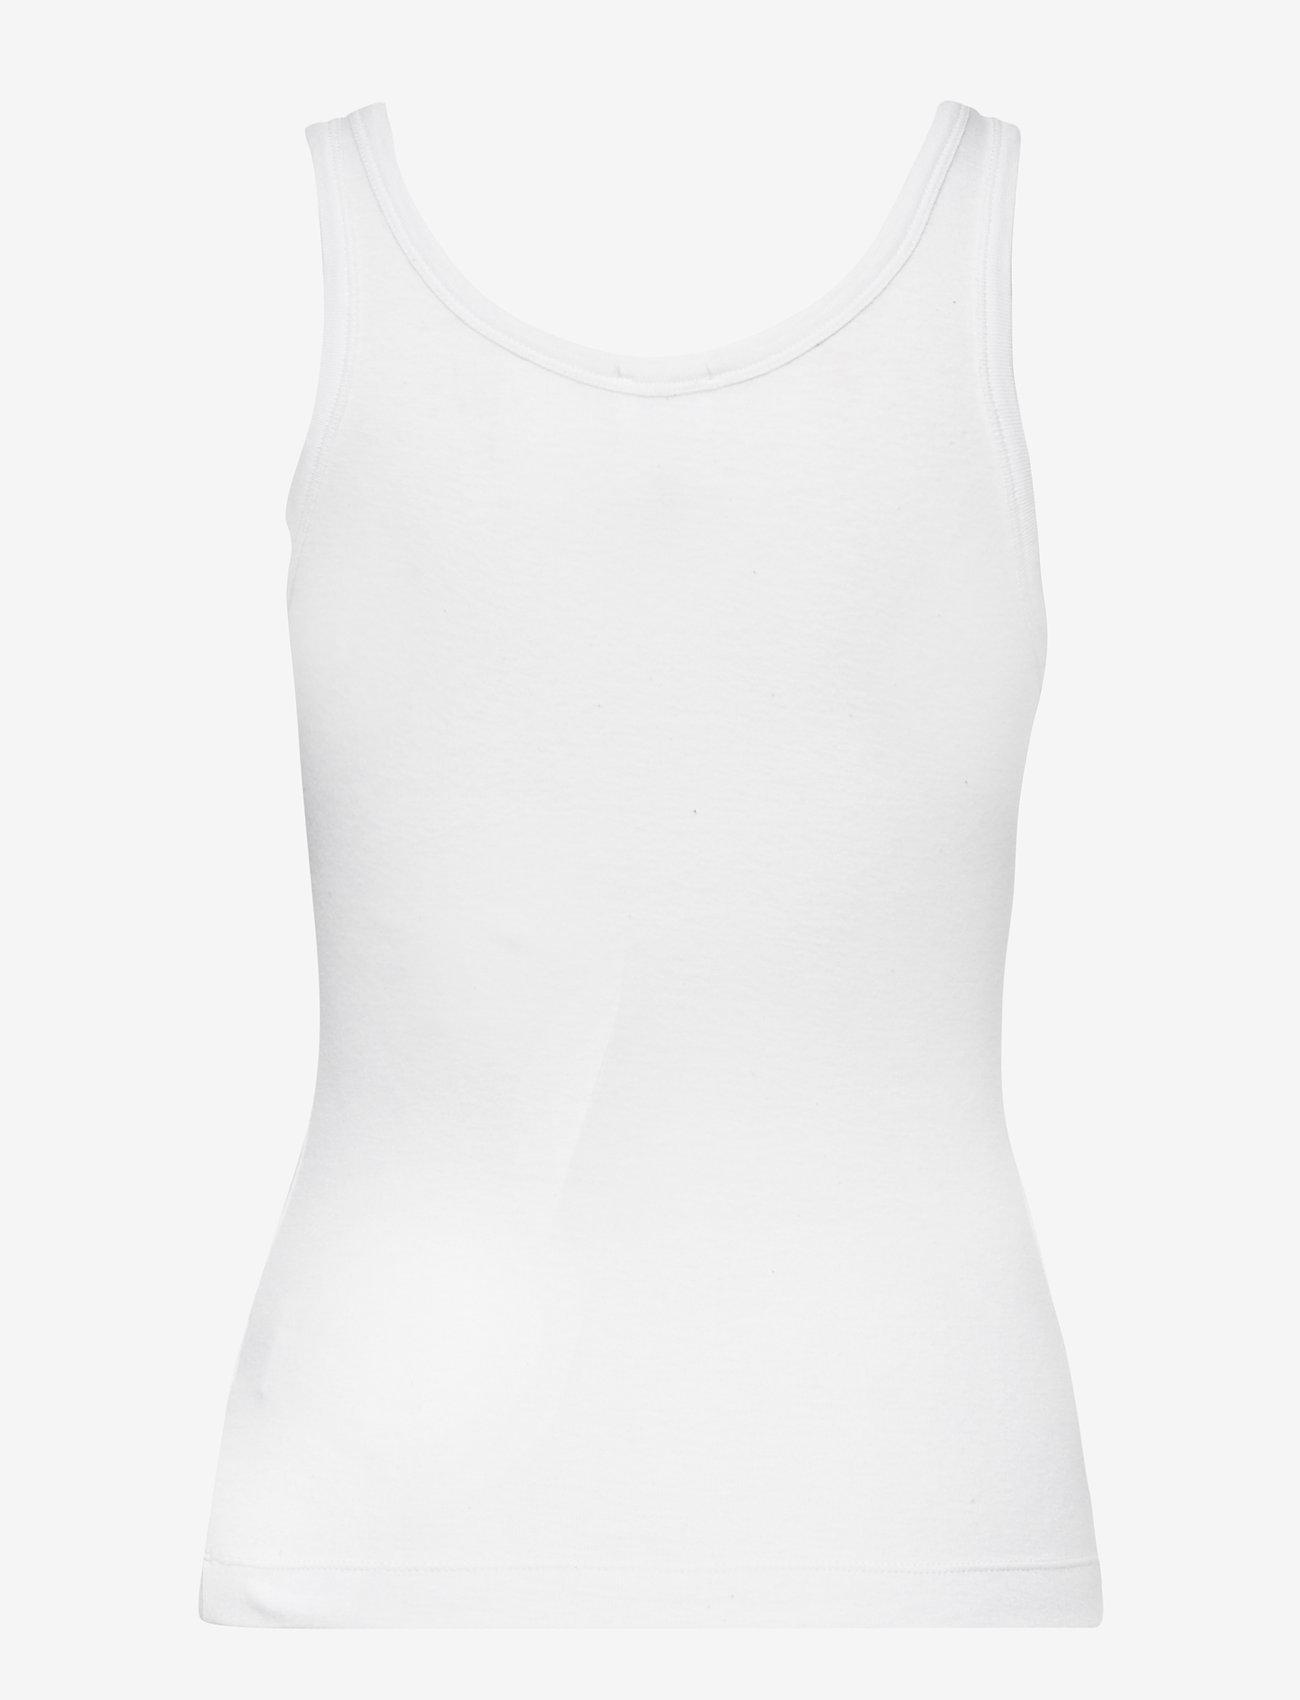 hálo - TUNDRA rib top - t-shirt & tops - white - 2